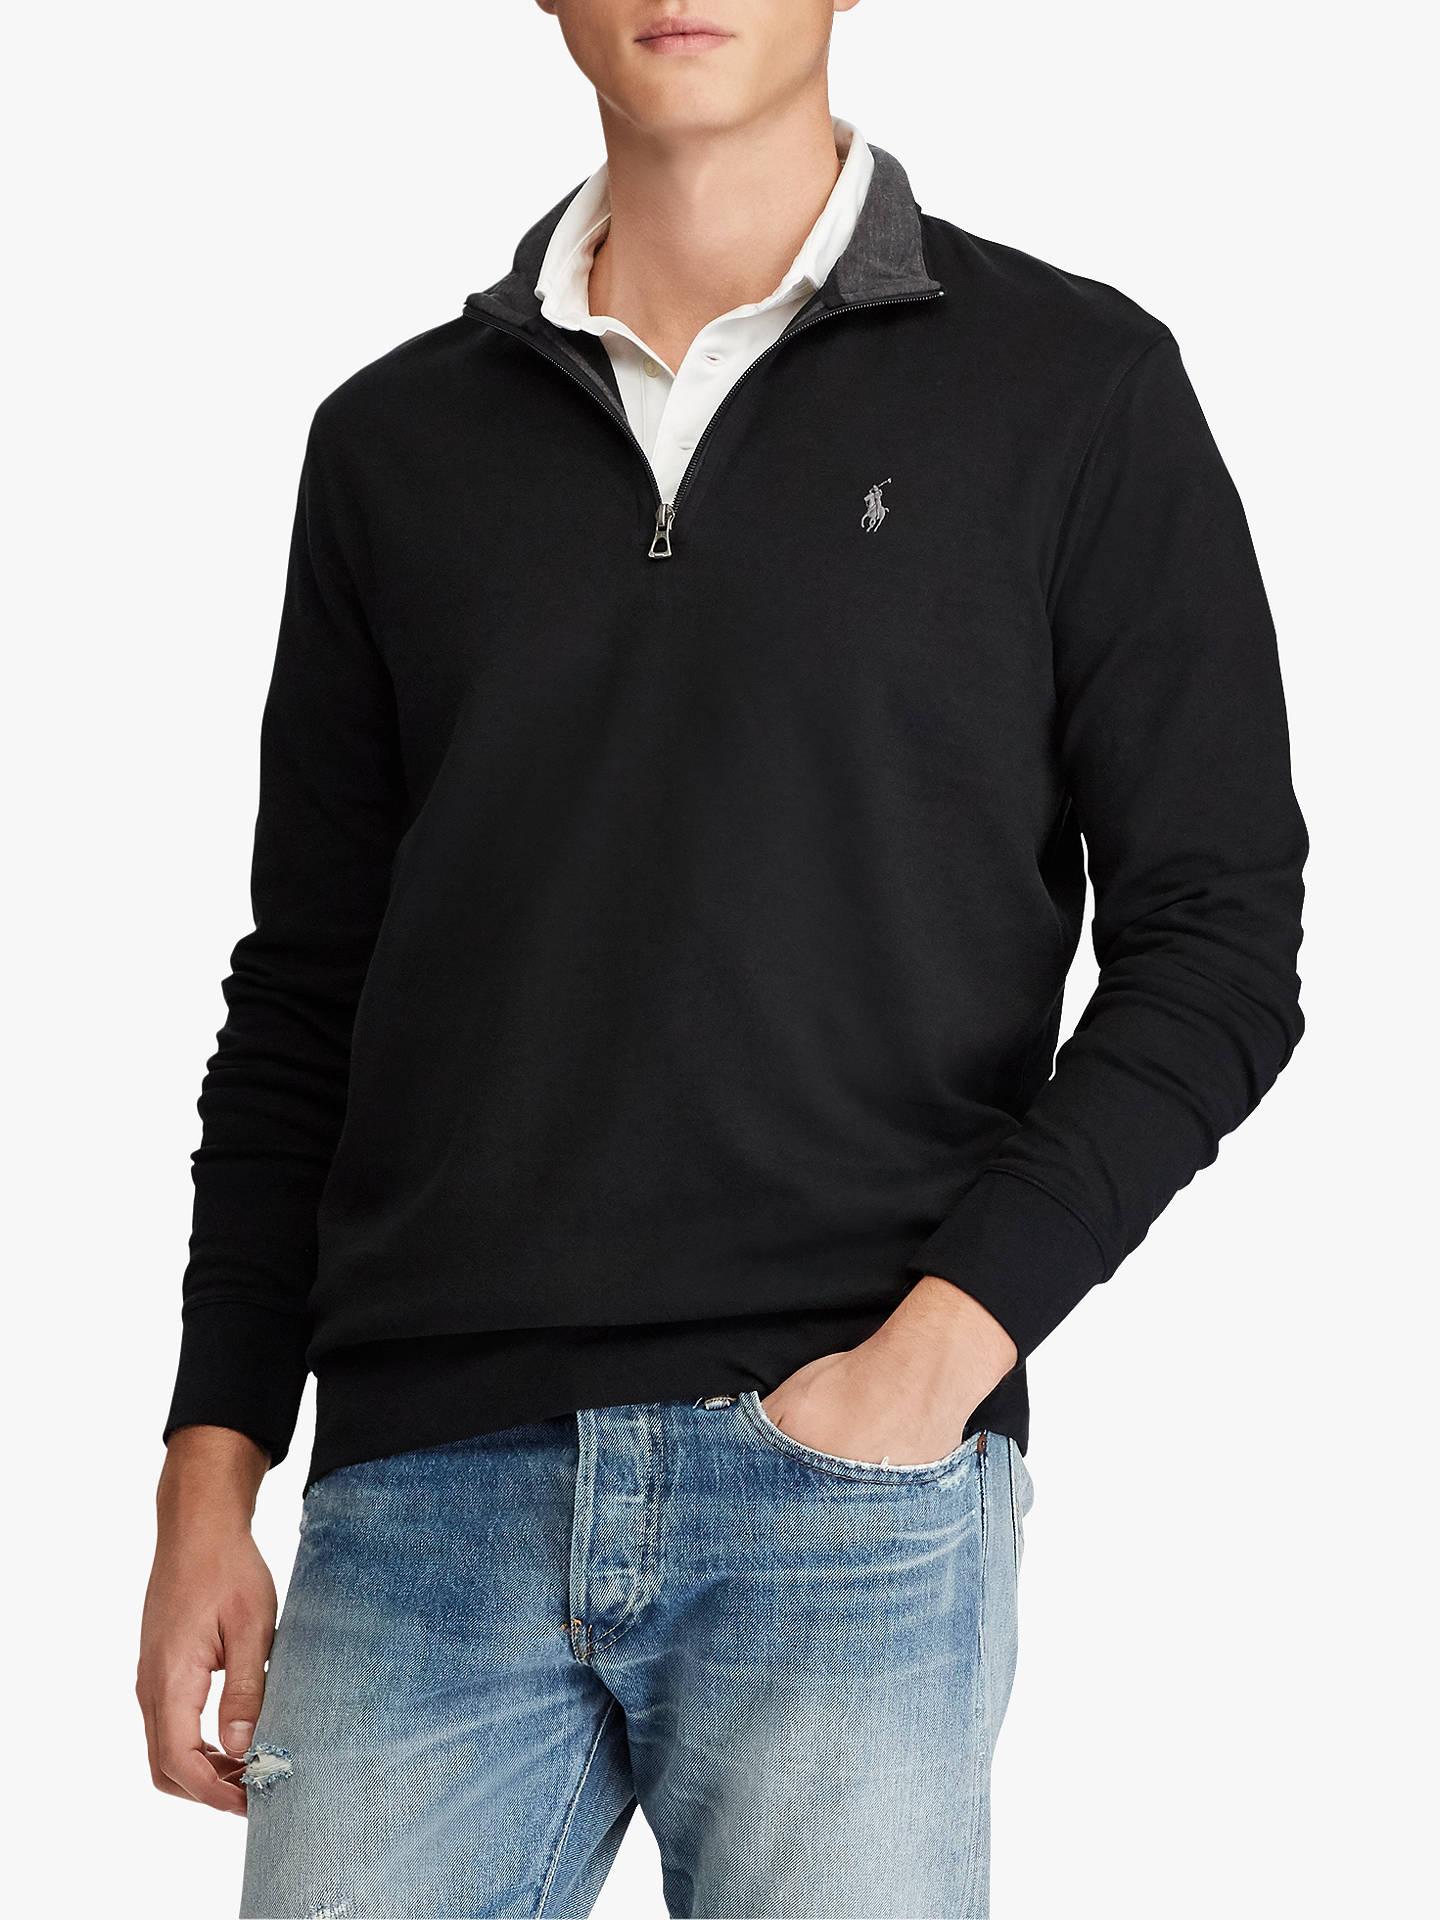 f8cfb9202322eb Buy Polo Ralph Lauren Half Zip Sweatshirt, Polo Black, XL Online at  johnlewis.